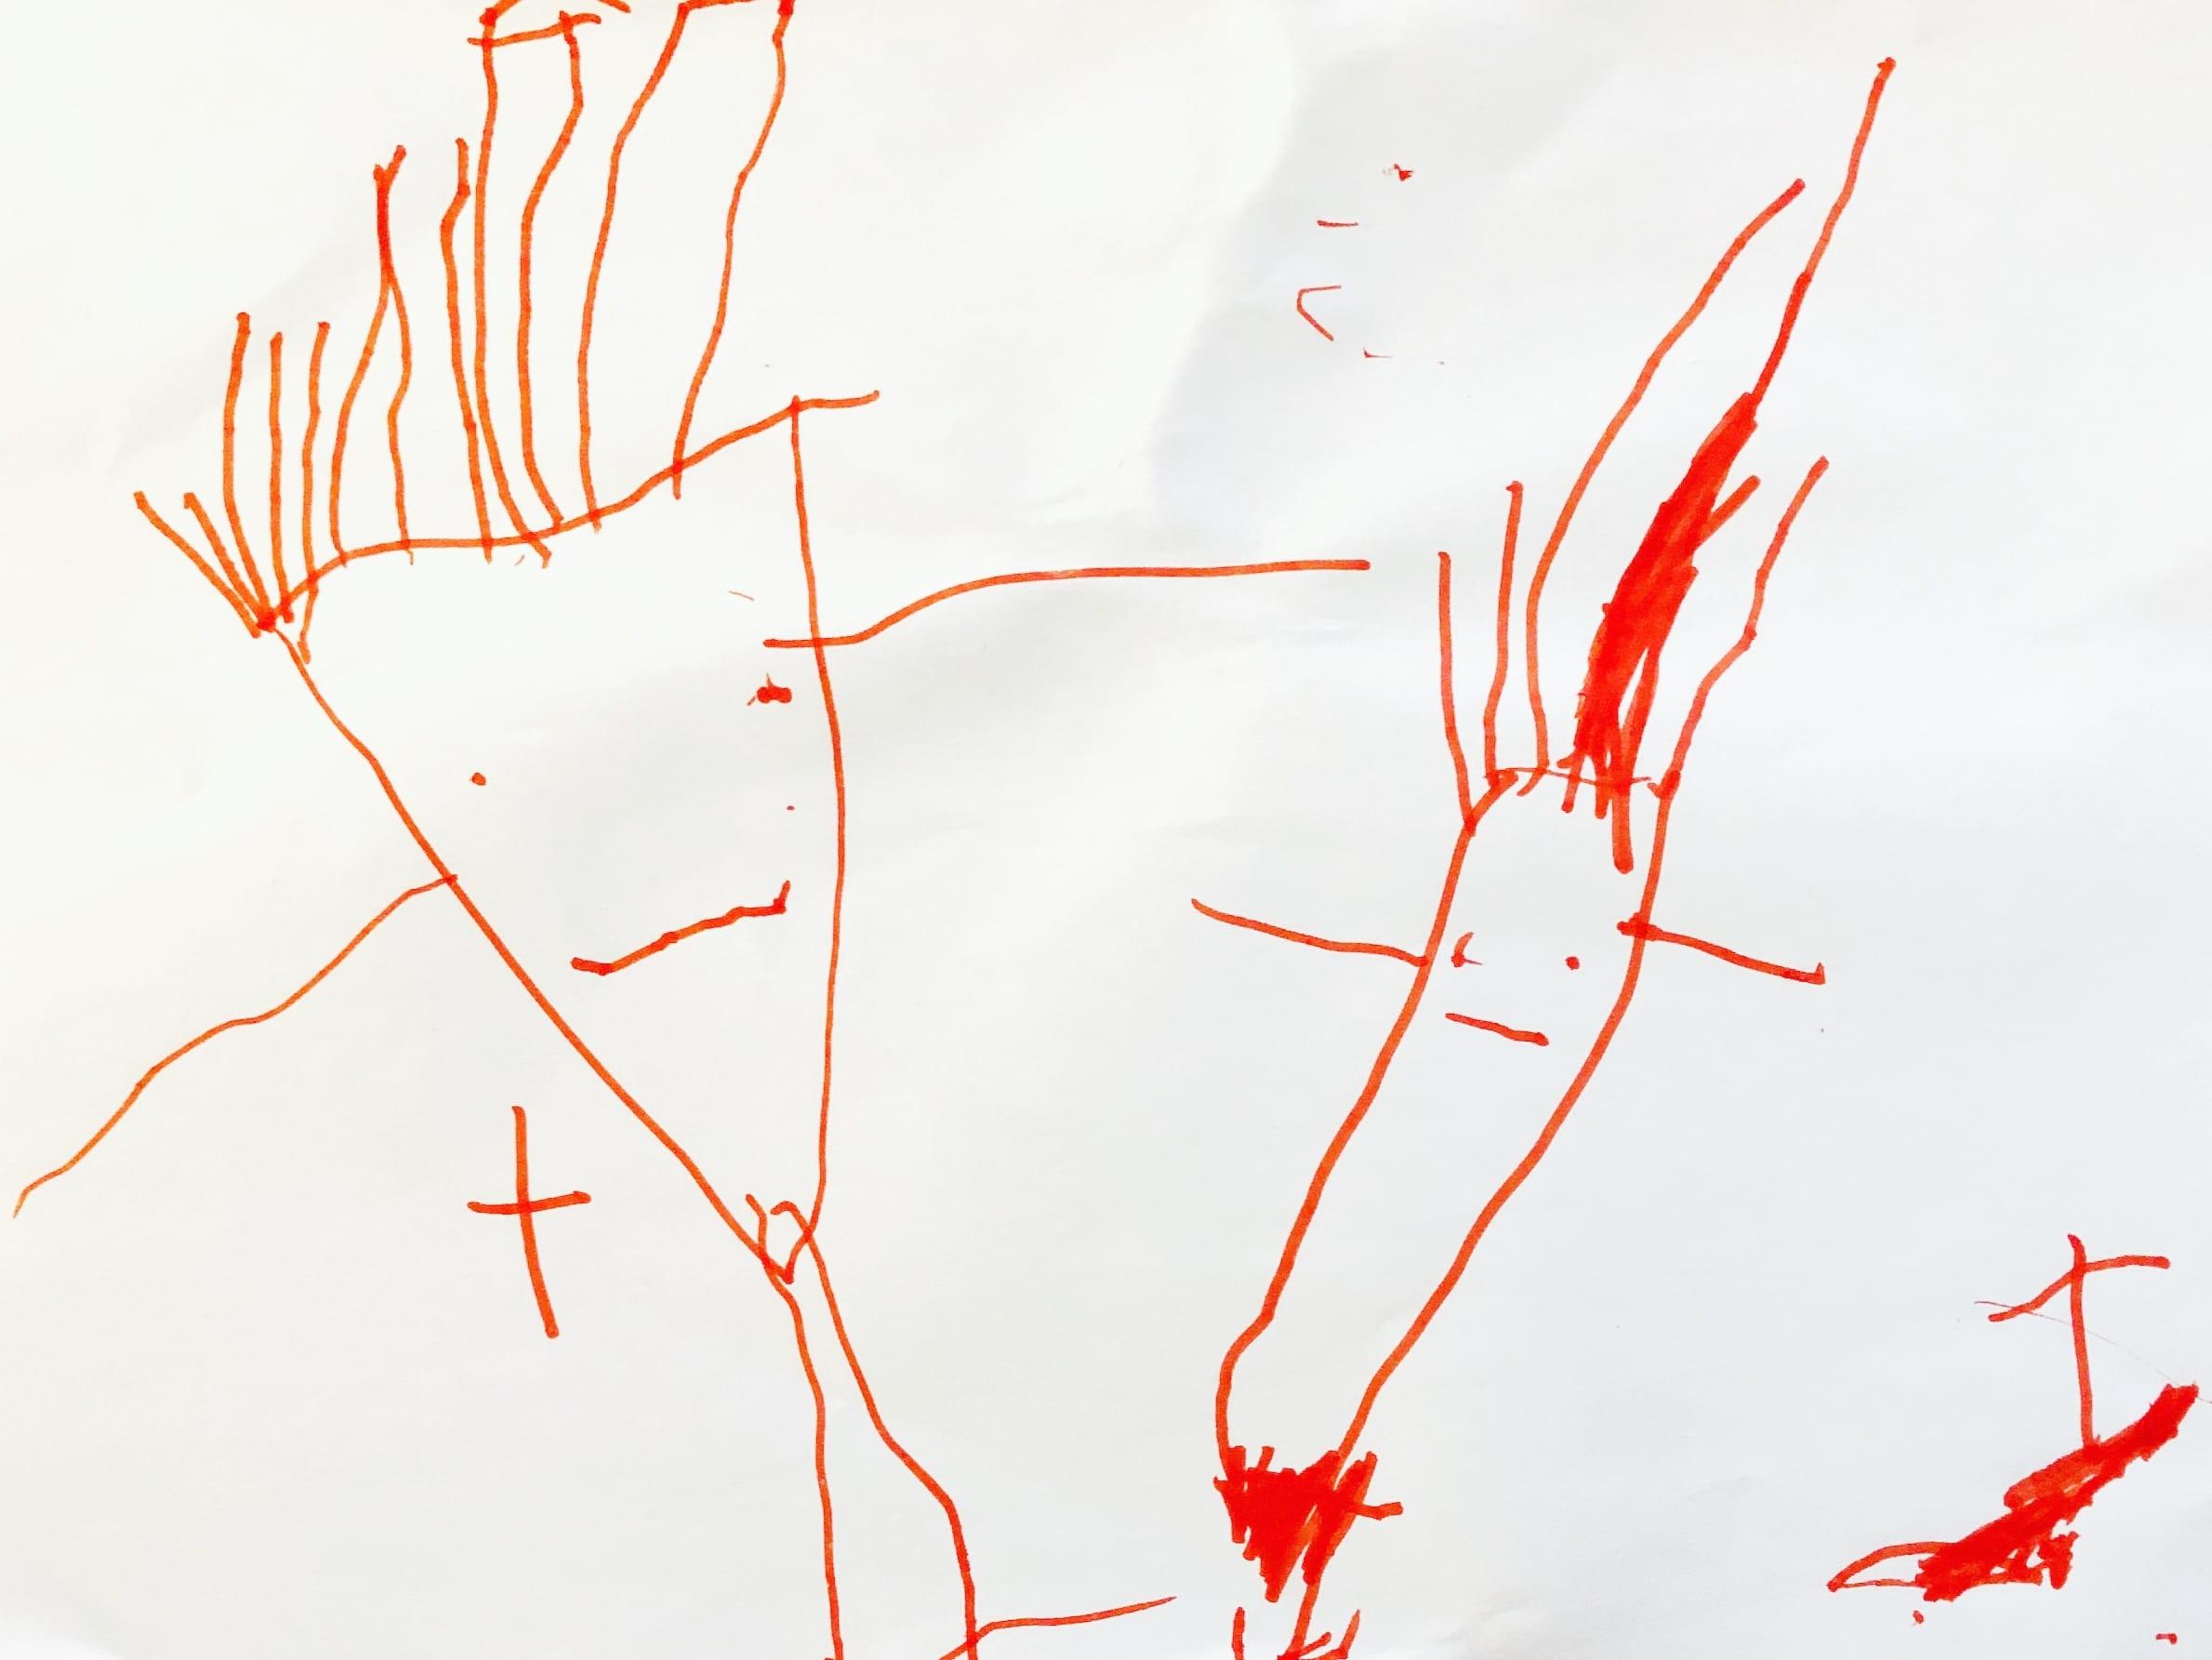 Kindertekeningen analyseren_haar_prikkels_Talking Drawings_Artie Farty